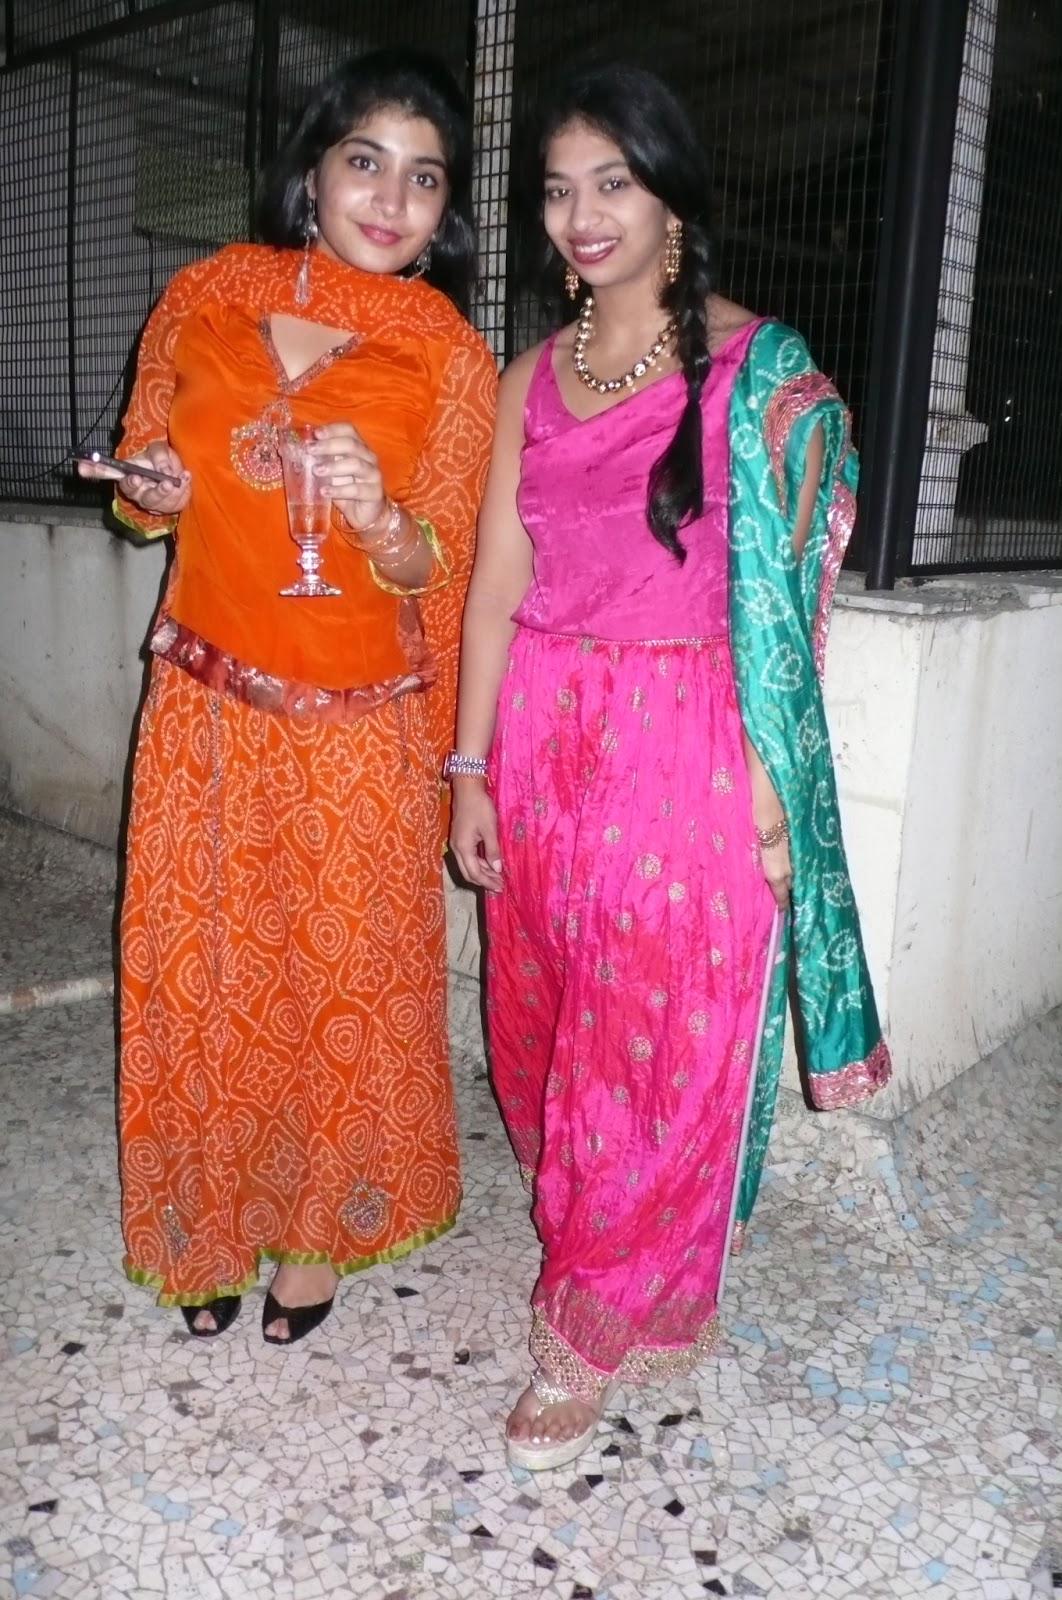 Nude Priyanka Gandhi Classy shobhaa de: november 2012